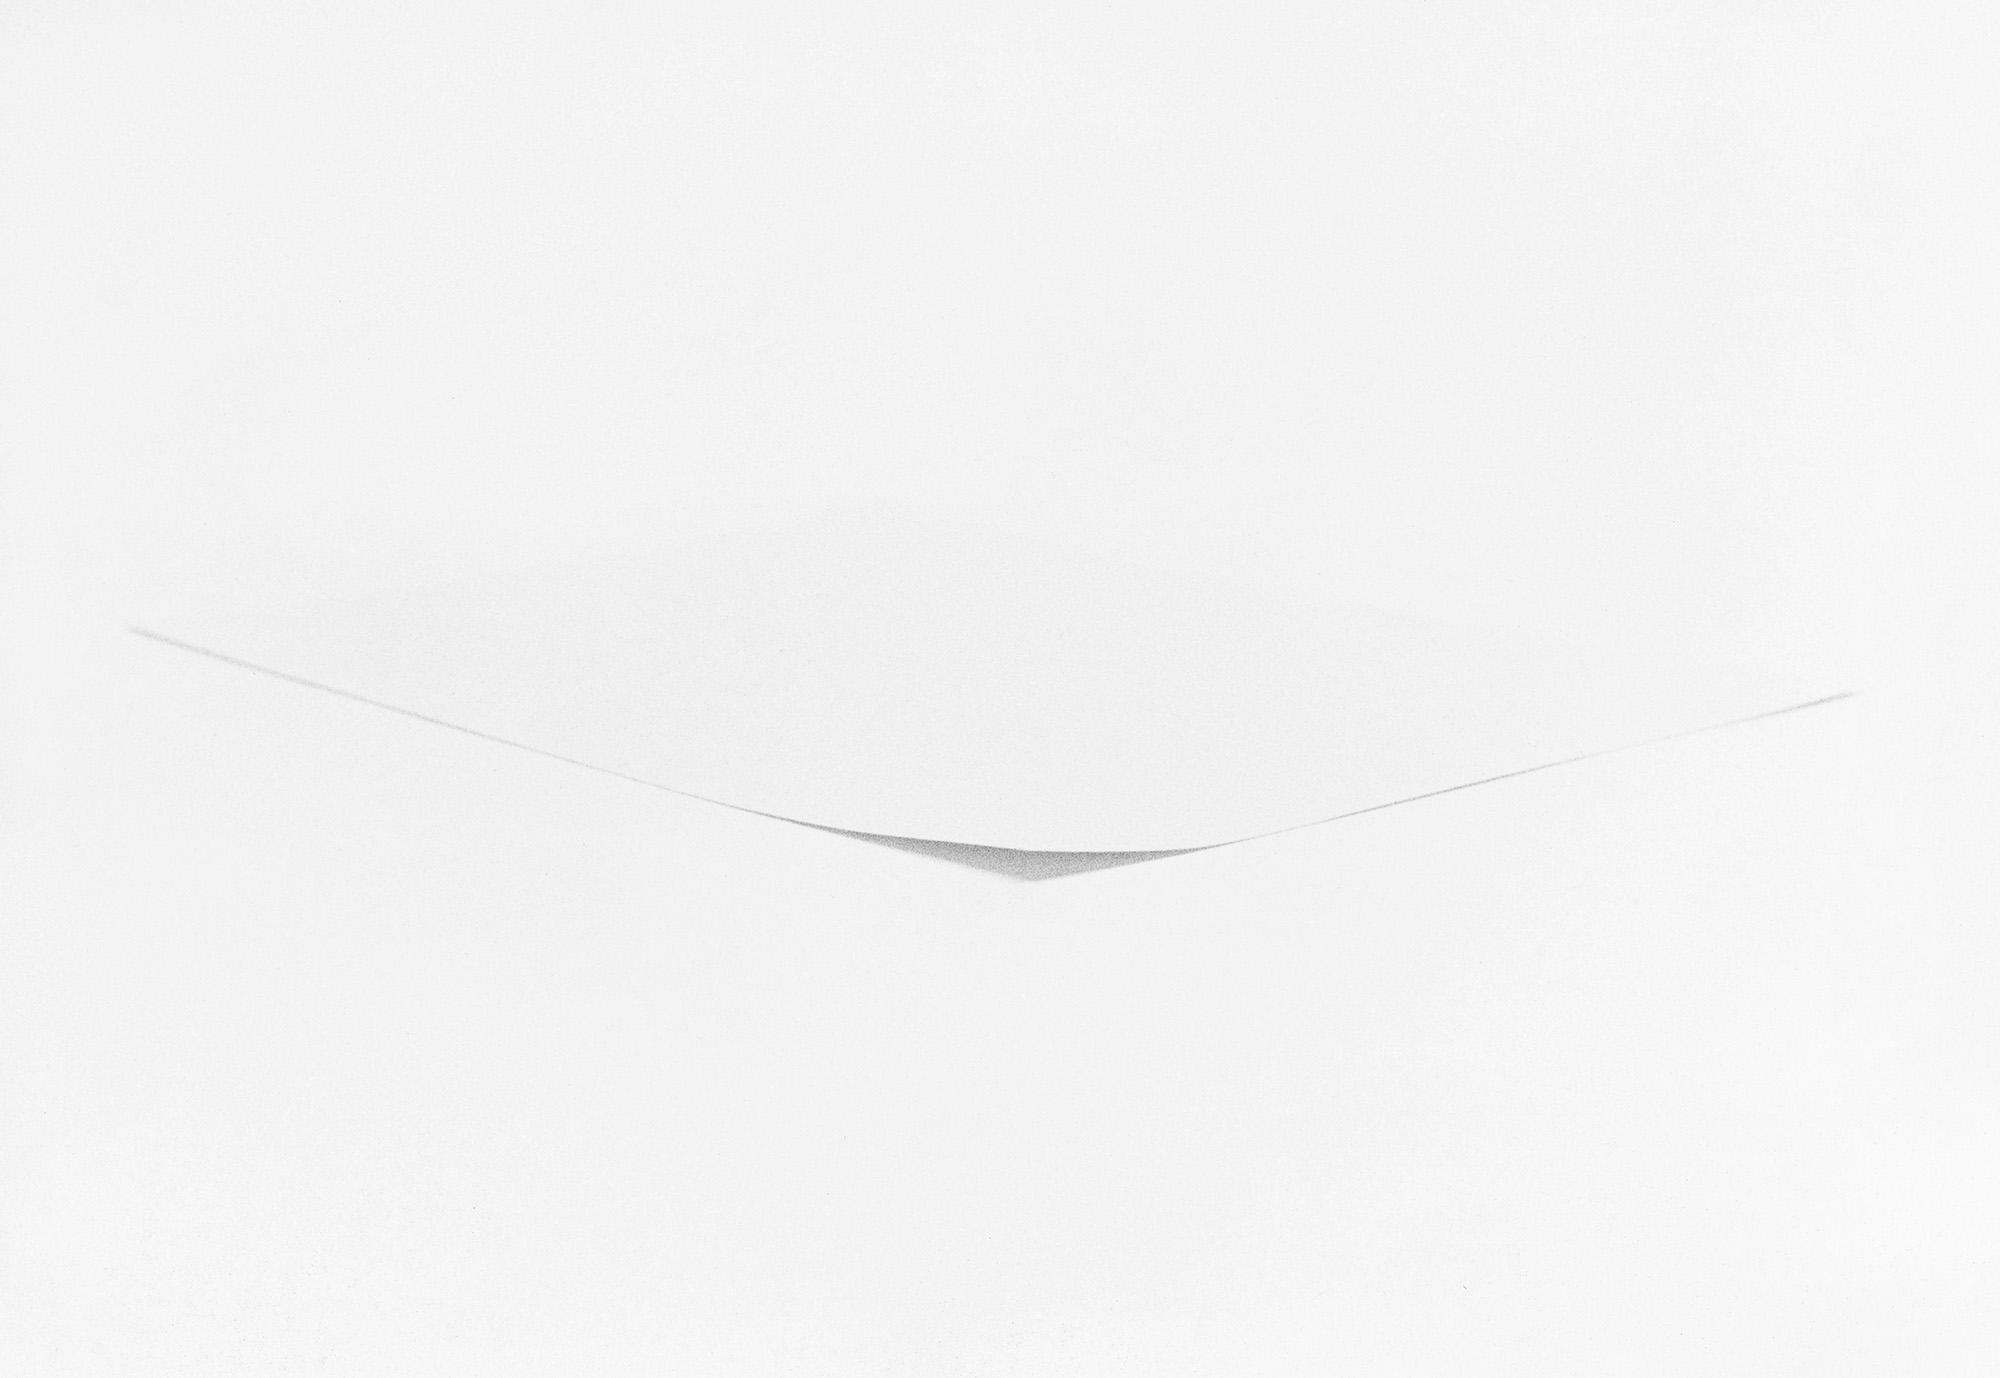 008 Rogier Houwen, Paper I